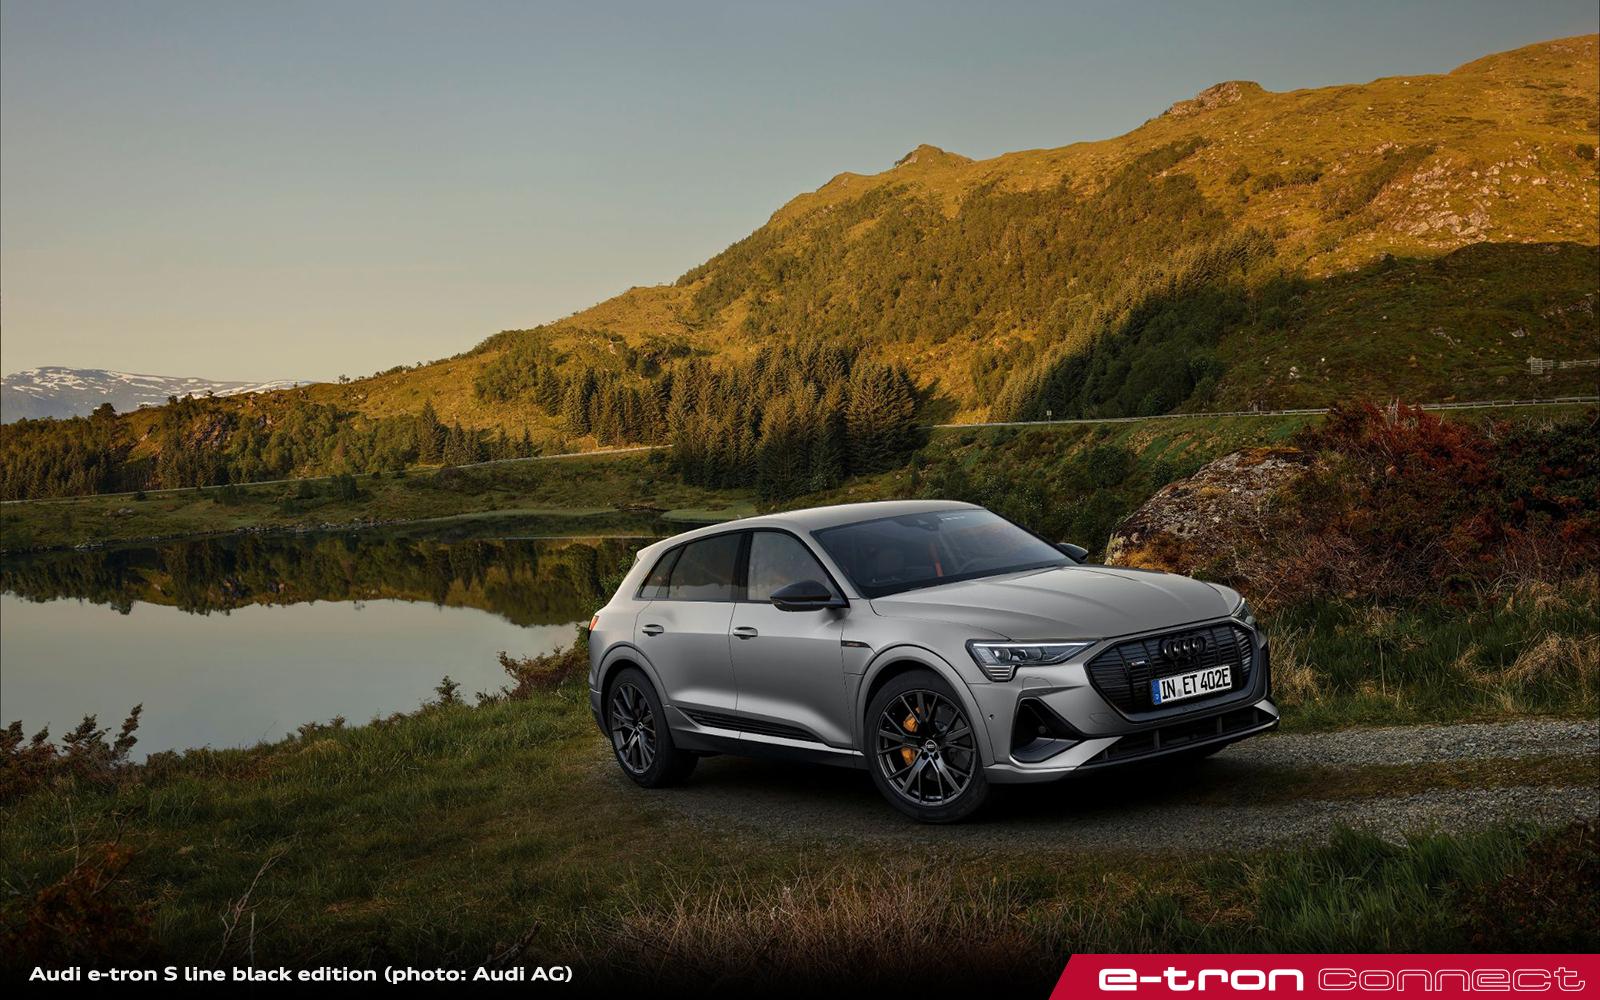 Progressive and Sporty Into the New Model Year: The Audi e-tron S line black edition